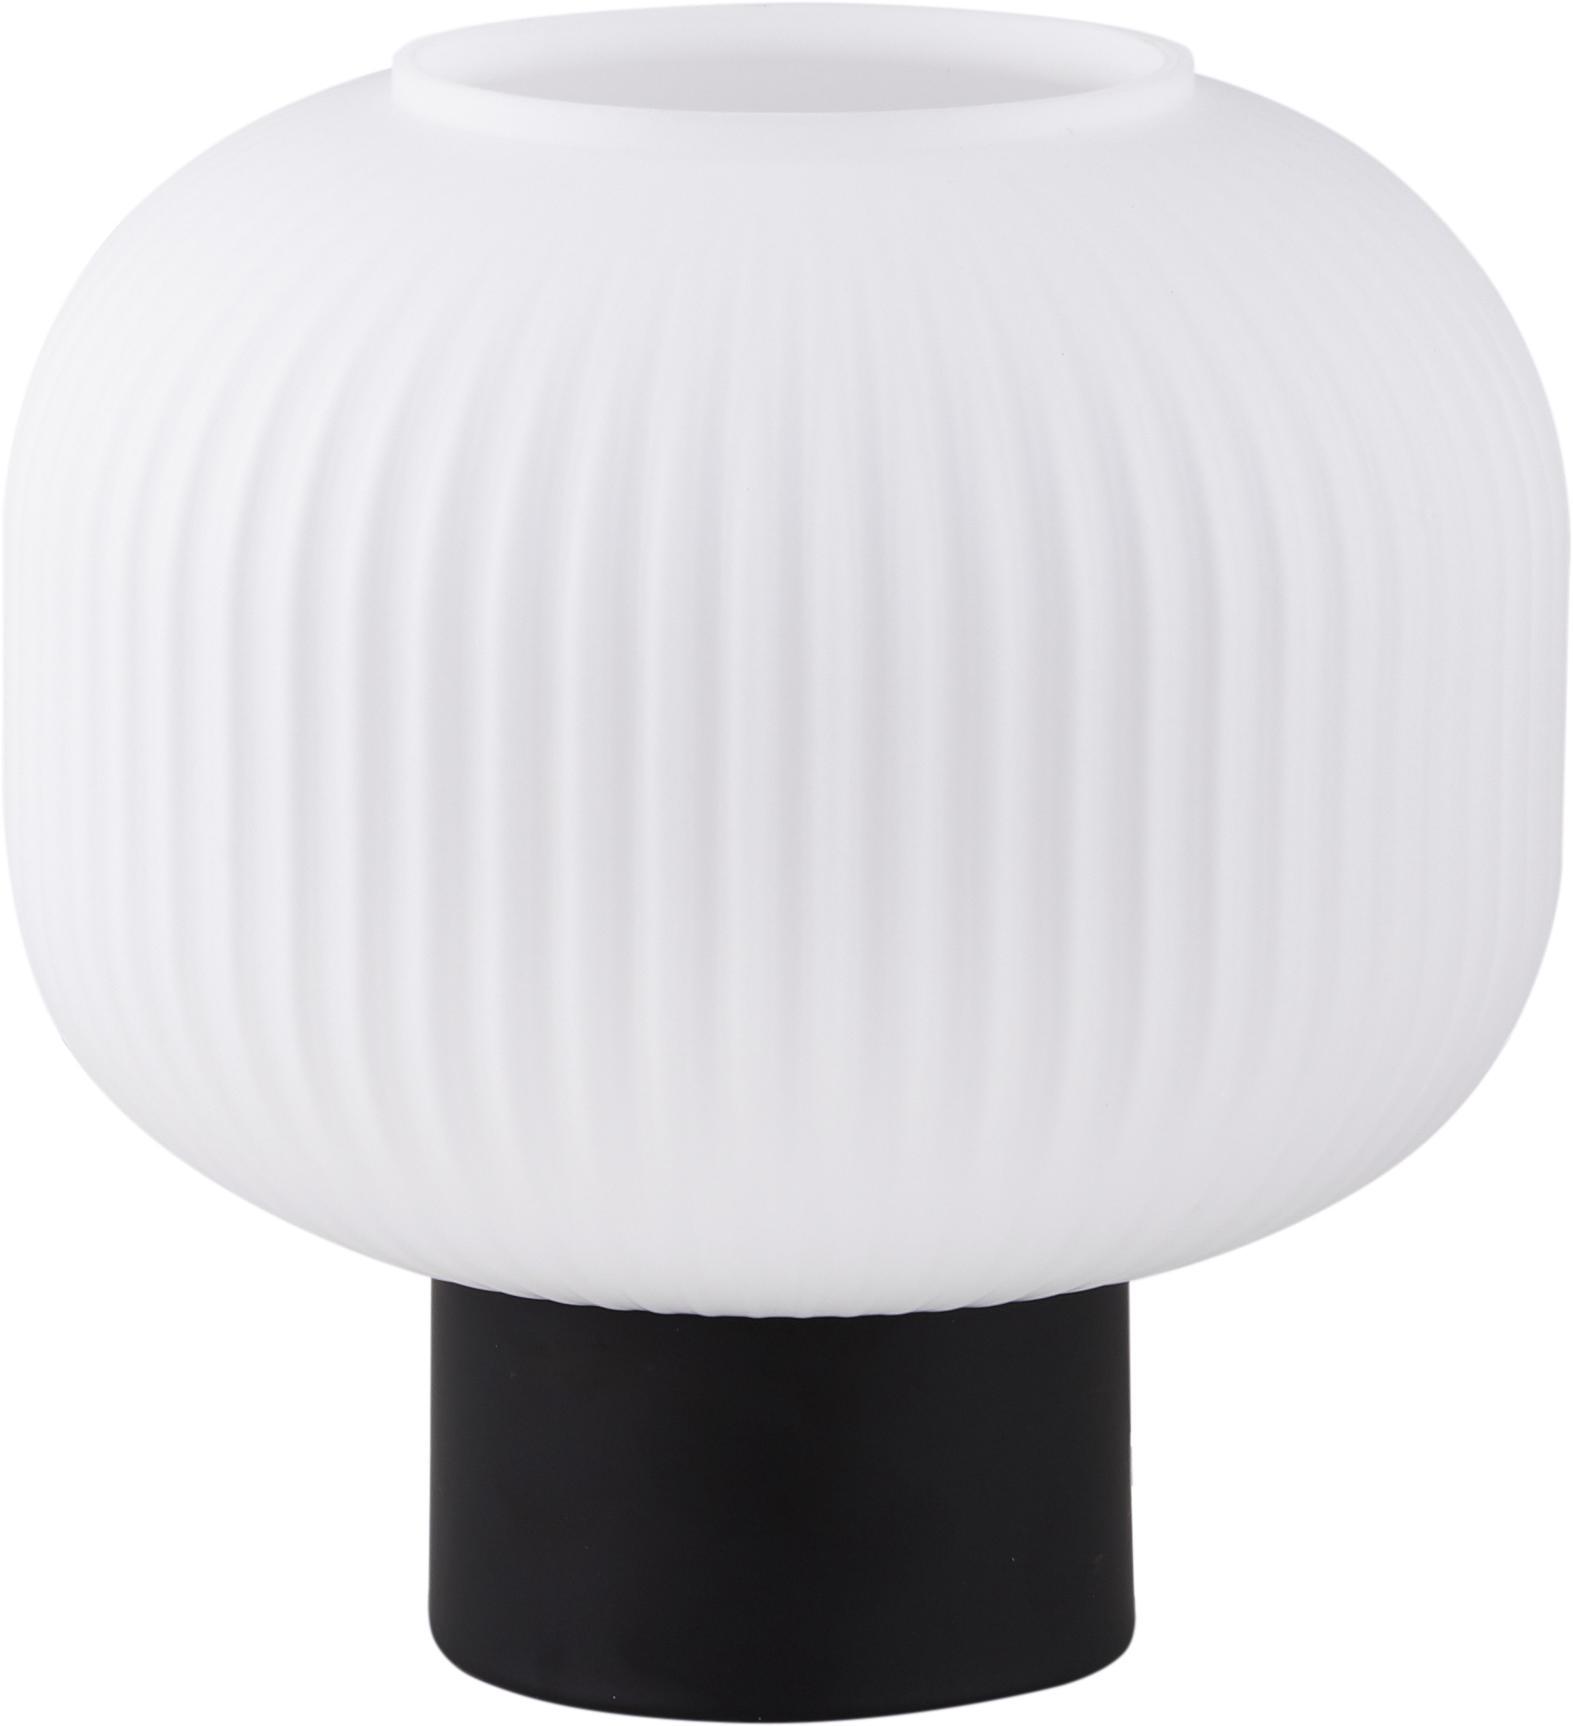 Tafellamp Milford, Opaalglas, metaal, Zwart, opaalwit, Ø 20 x H 20 cm